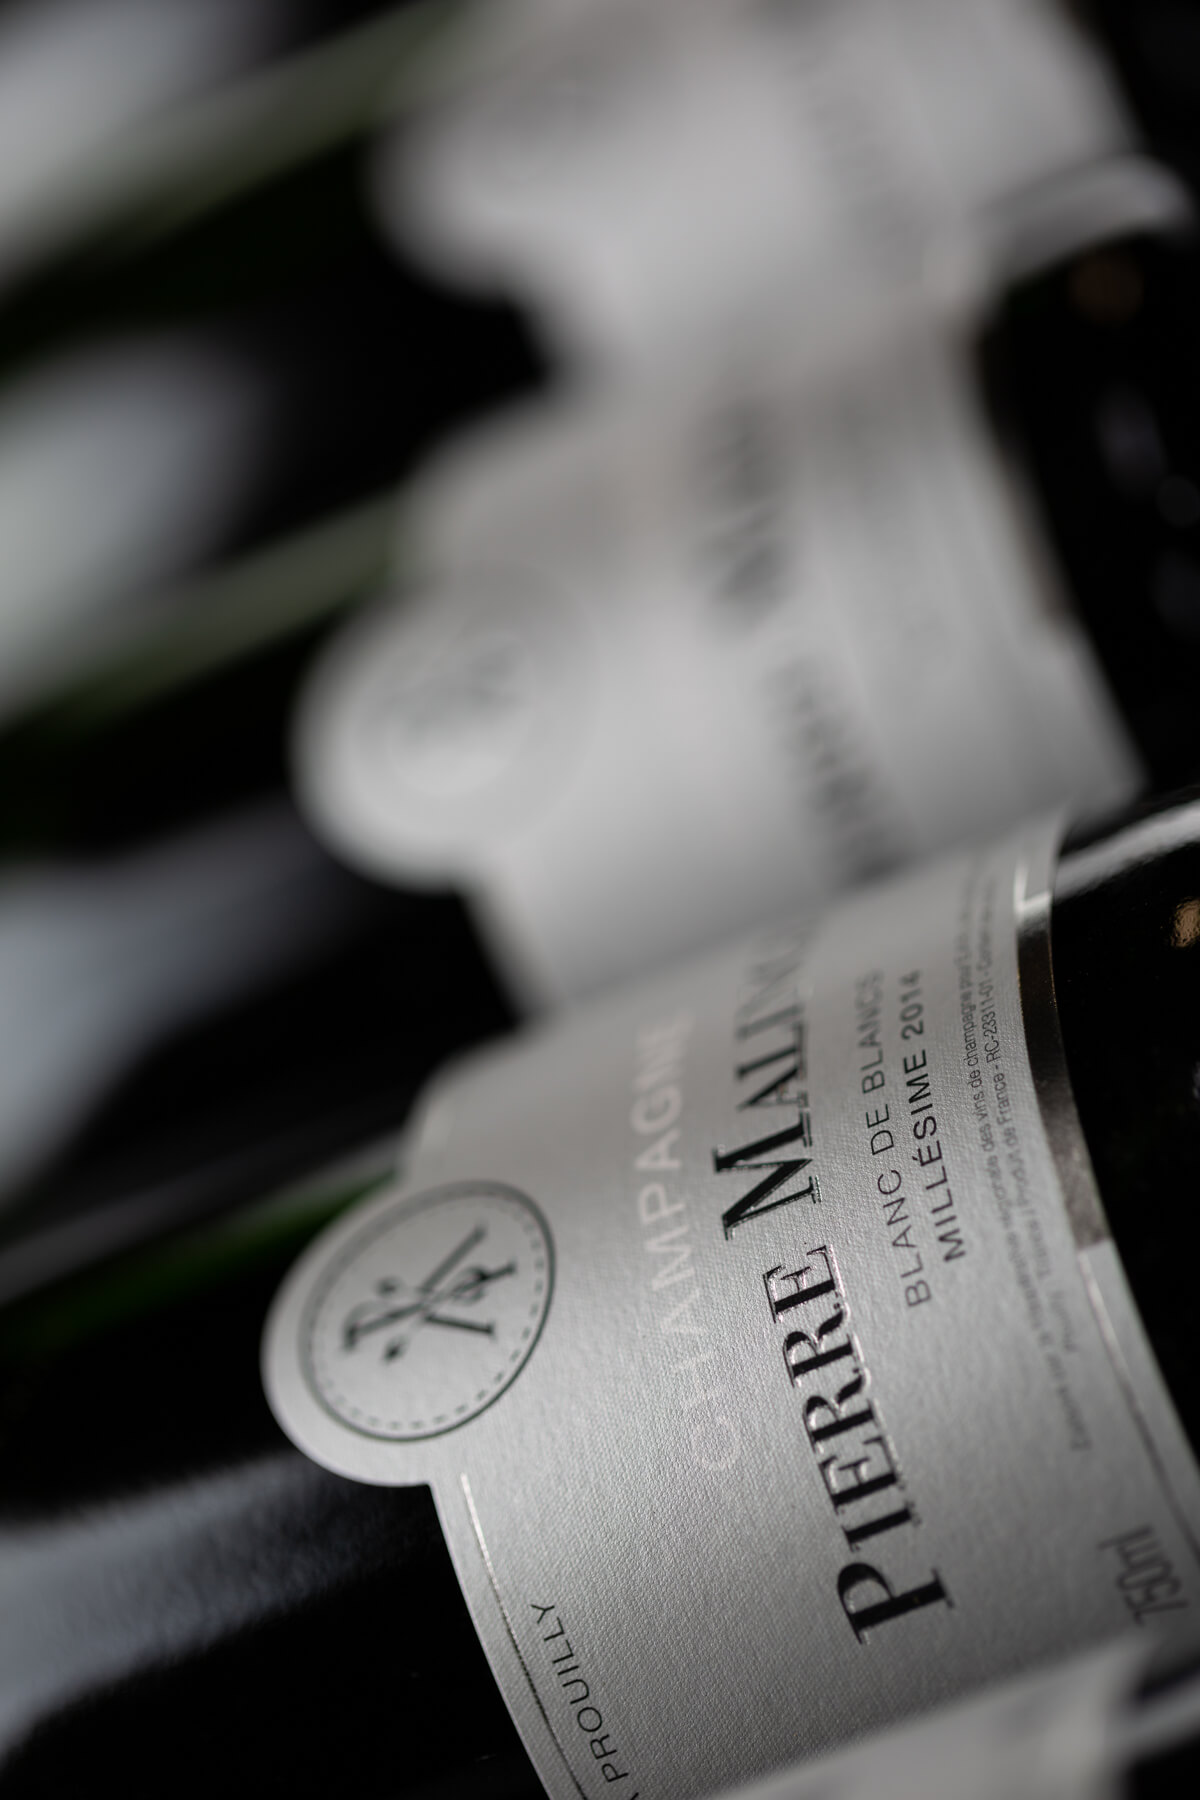 Photographe Champagne Epernay - Tristan Meunier - Champagne Malingre -7.jpg